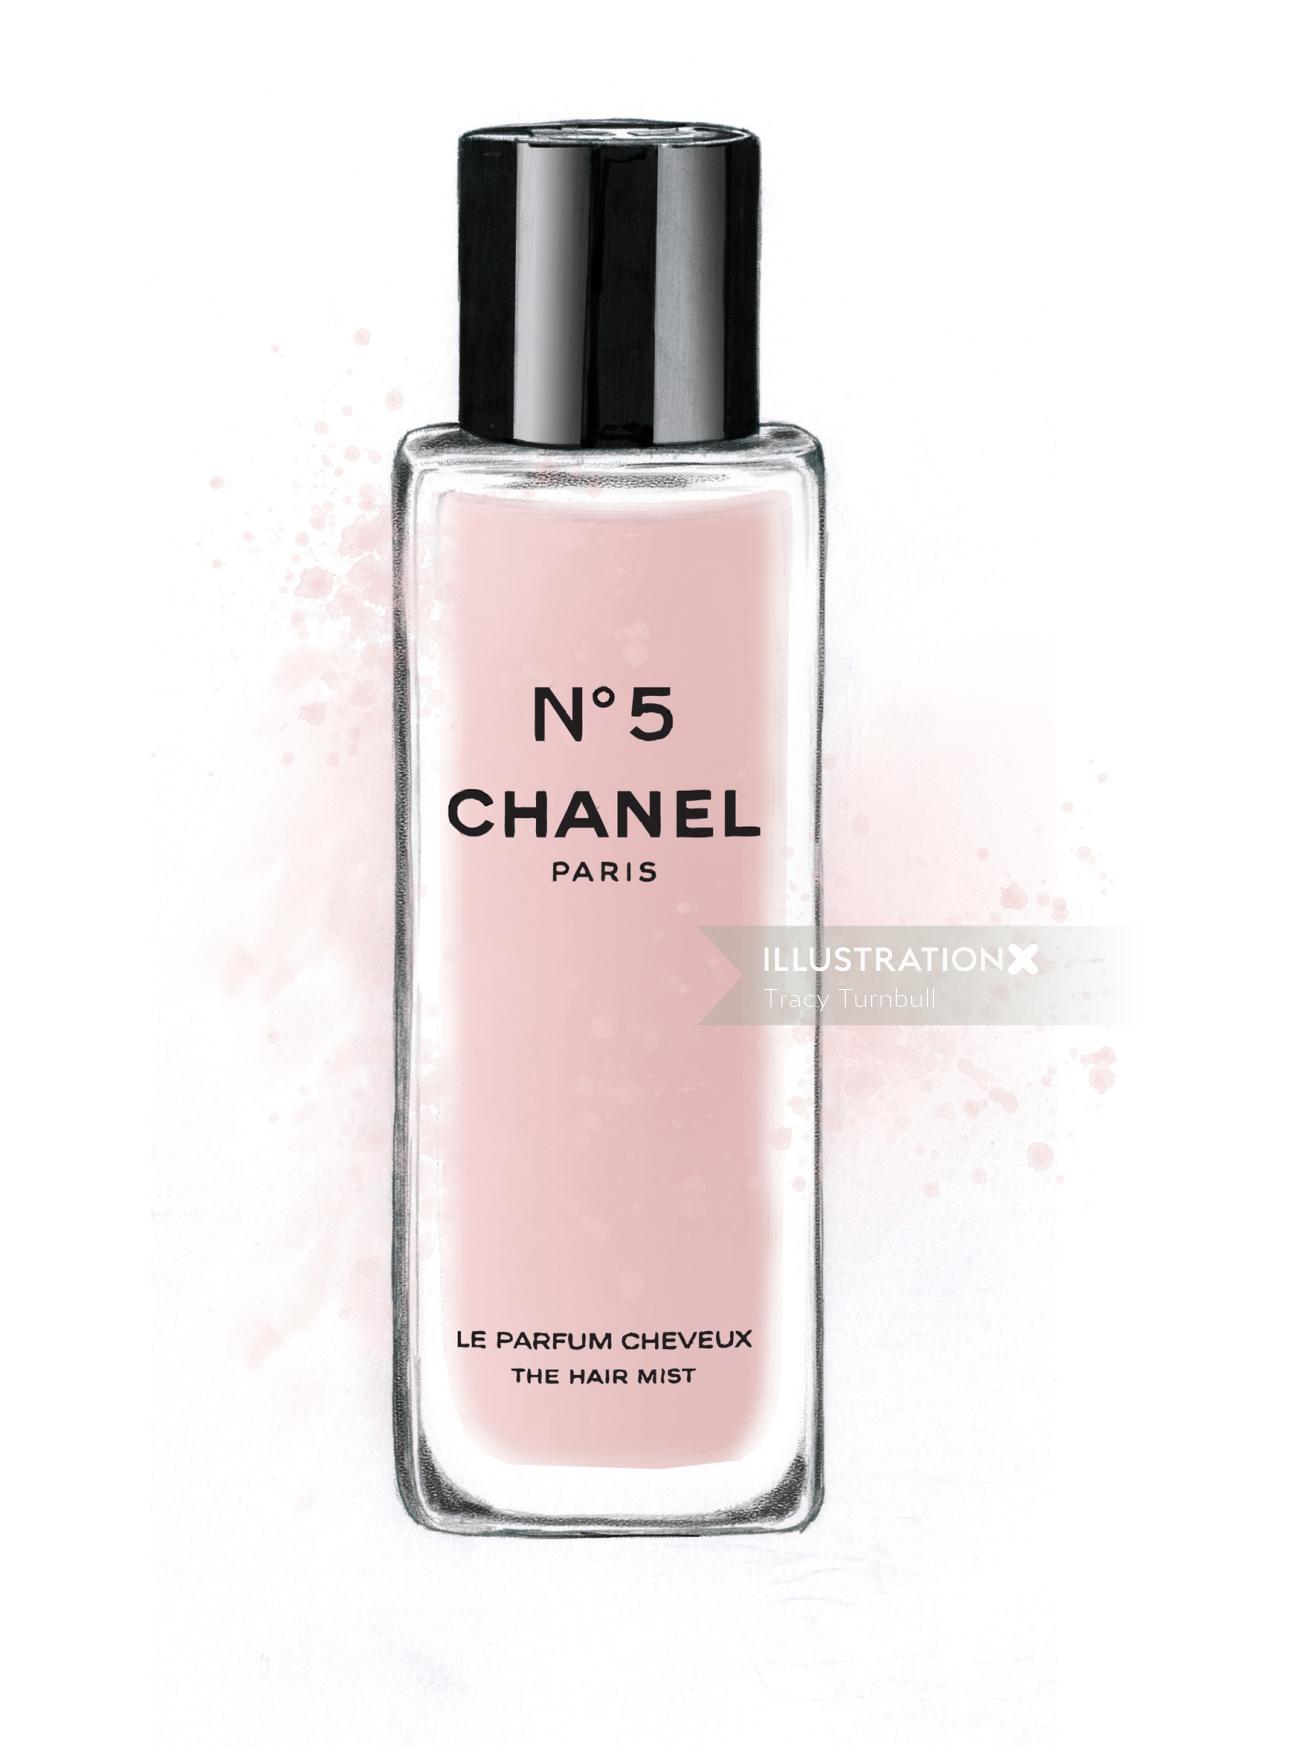 illustration of hair mist    Chanel No 5